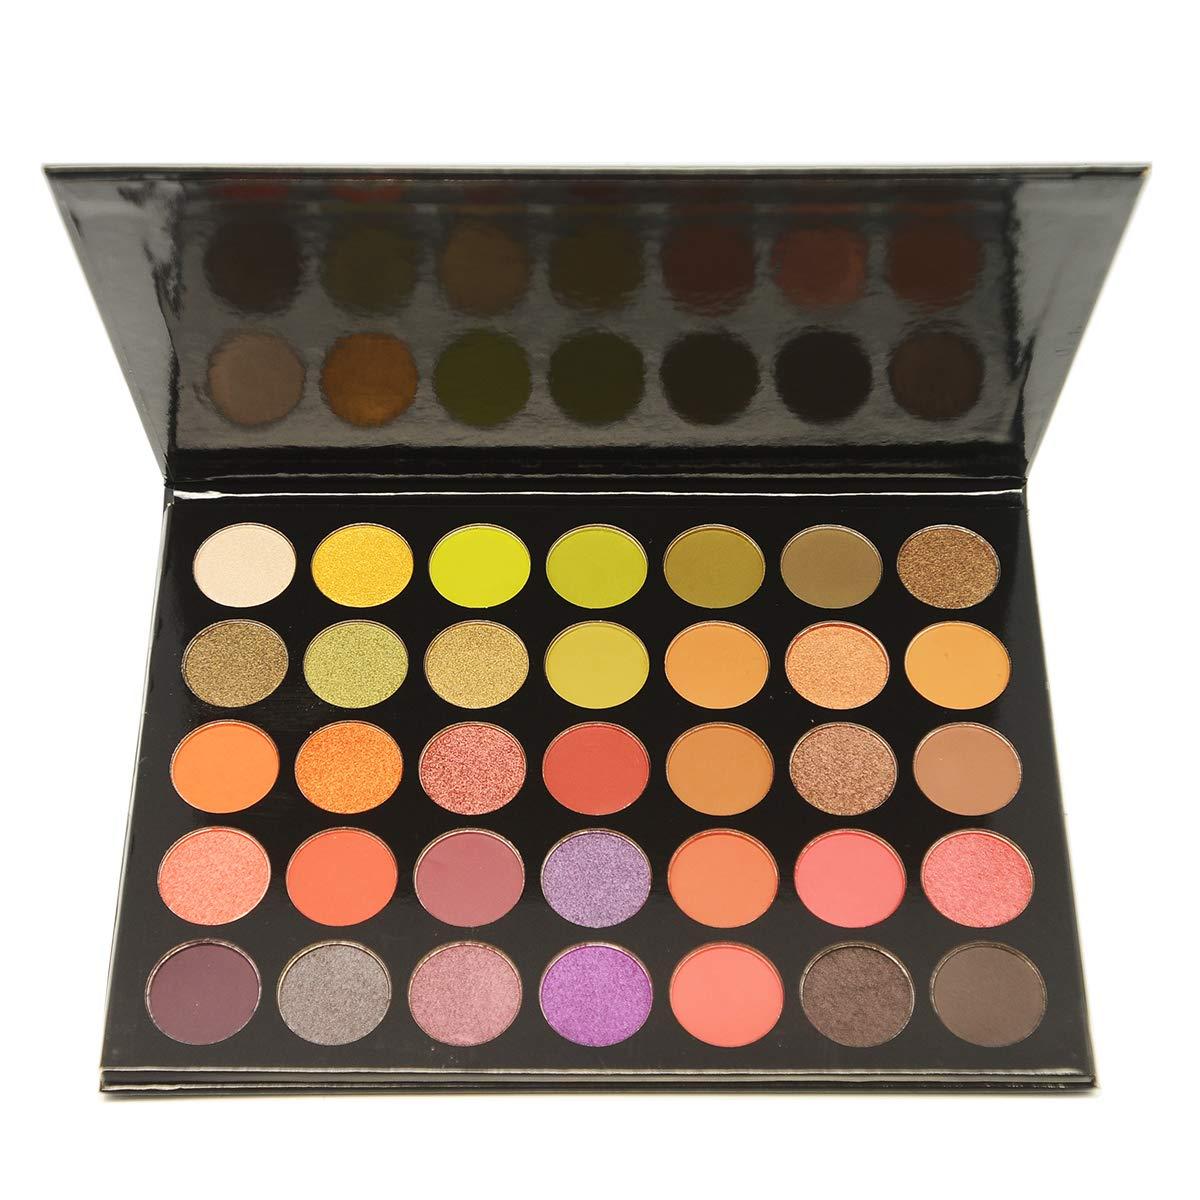 MAKEUP DEPOT The Black Book 35 color Eyeshadow